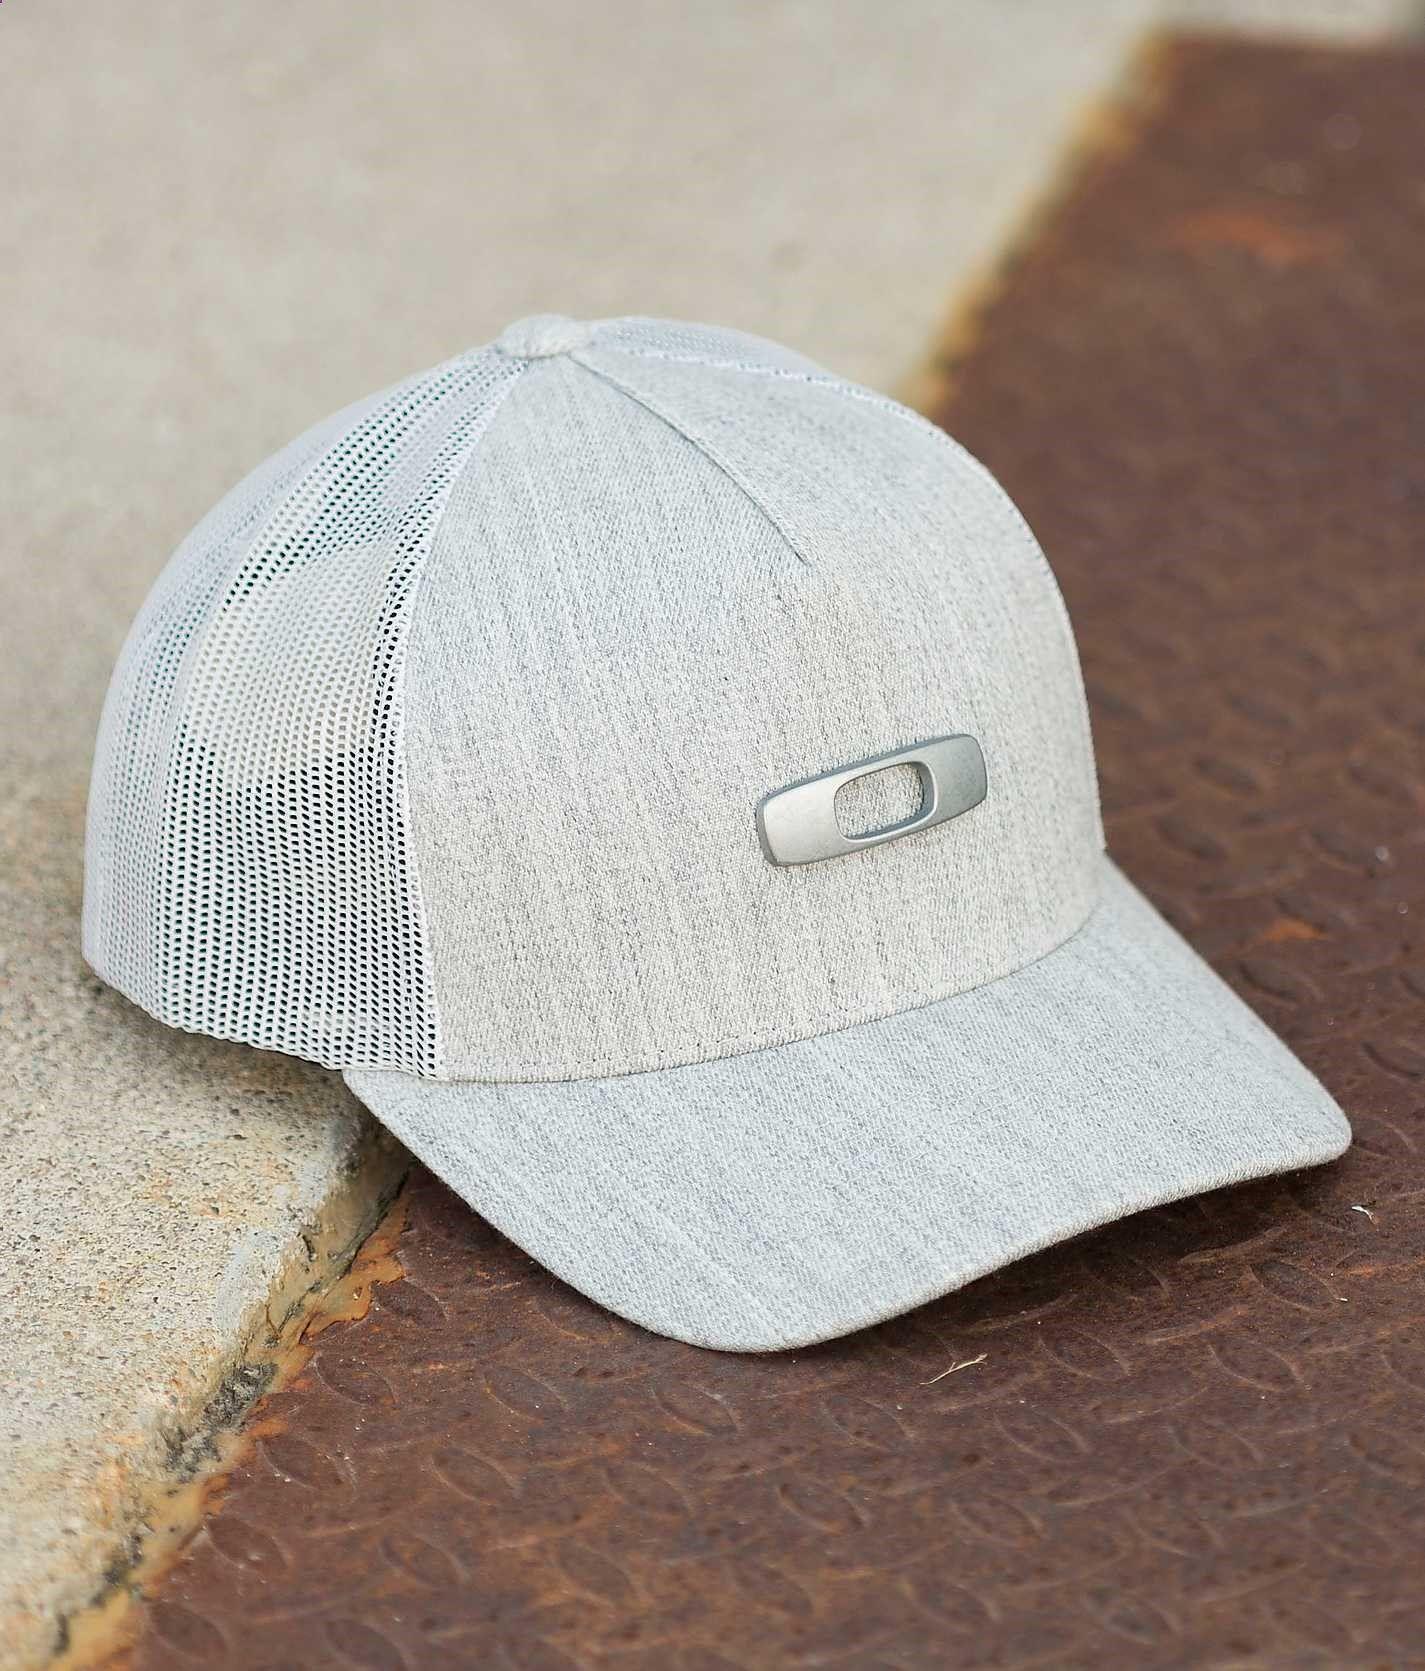 exclusive range outlet on sale best sale Dolores on | Hats for men, Mens trucker hat, Oakley clothes